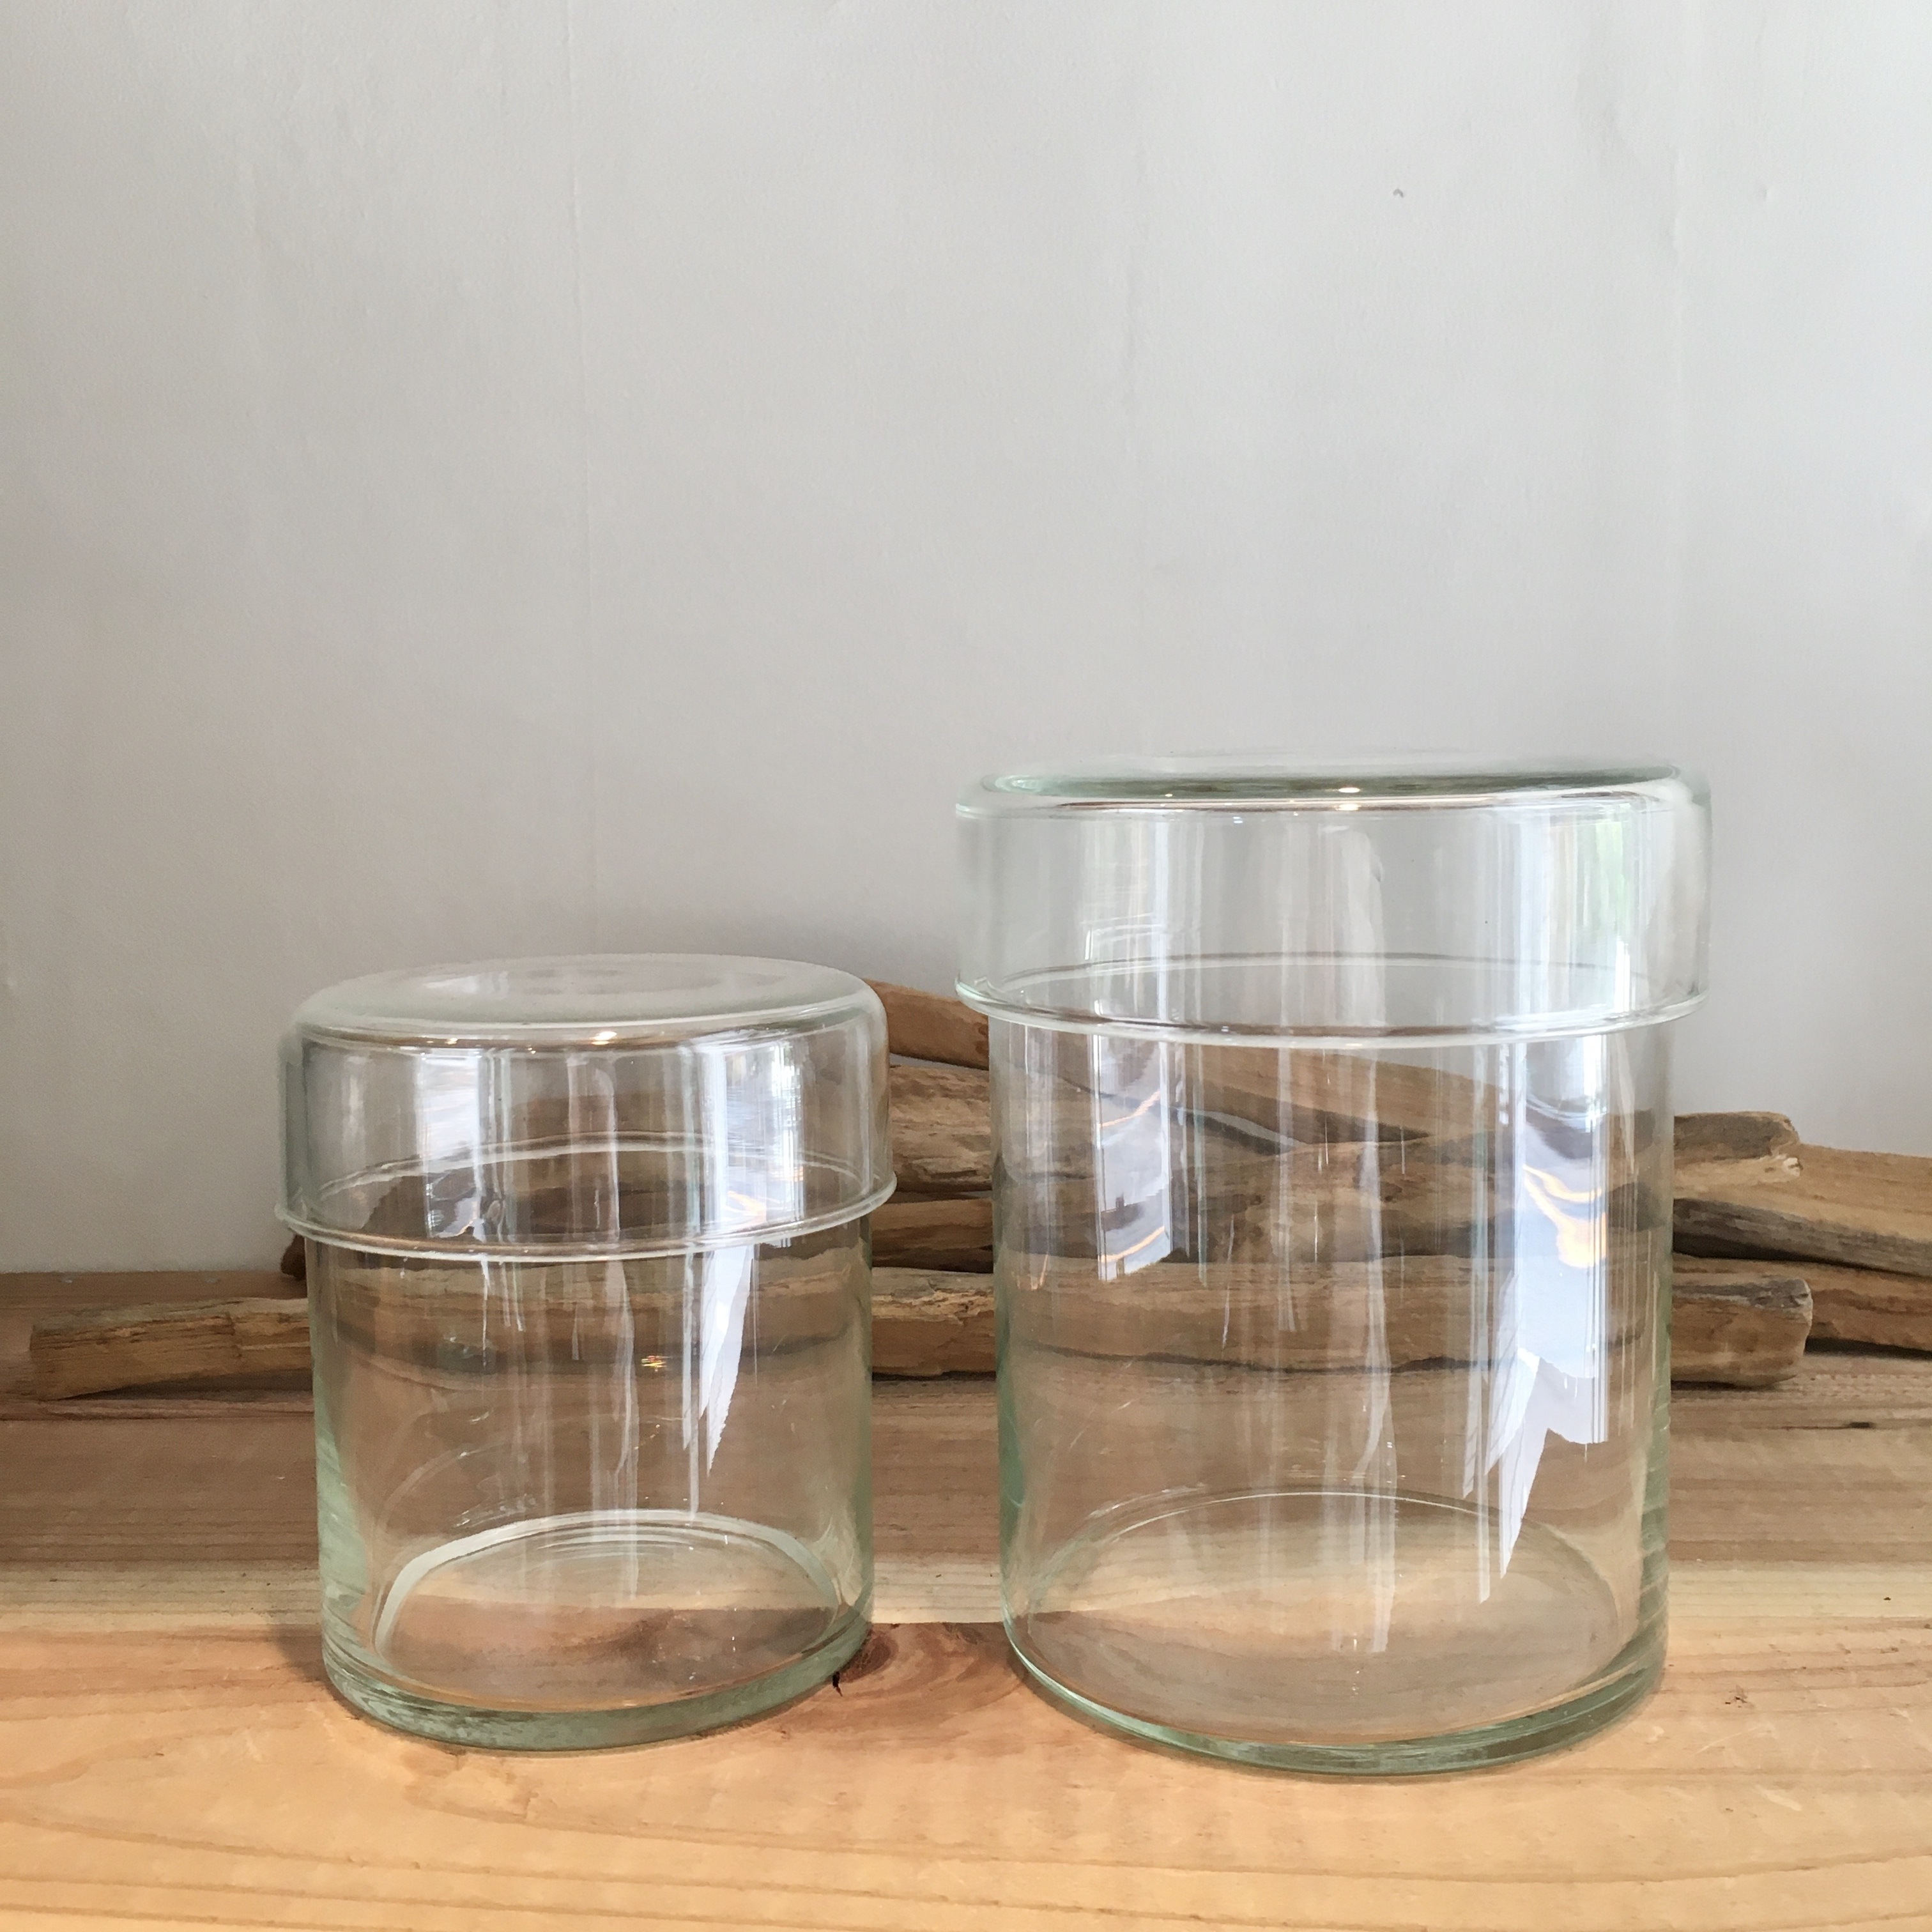 """ Reuse glass Canister M / リューズガラス キャニスター M """